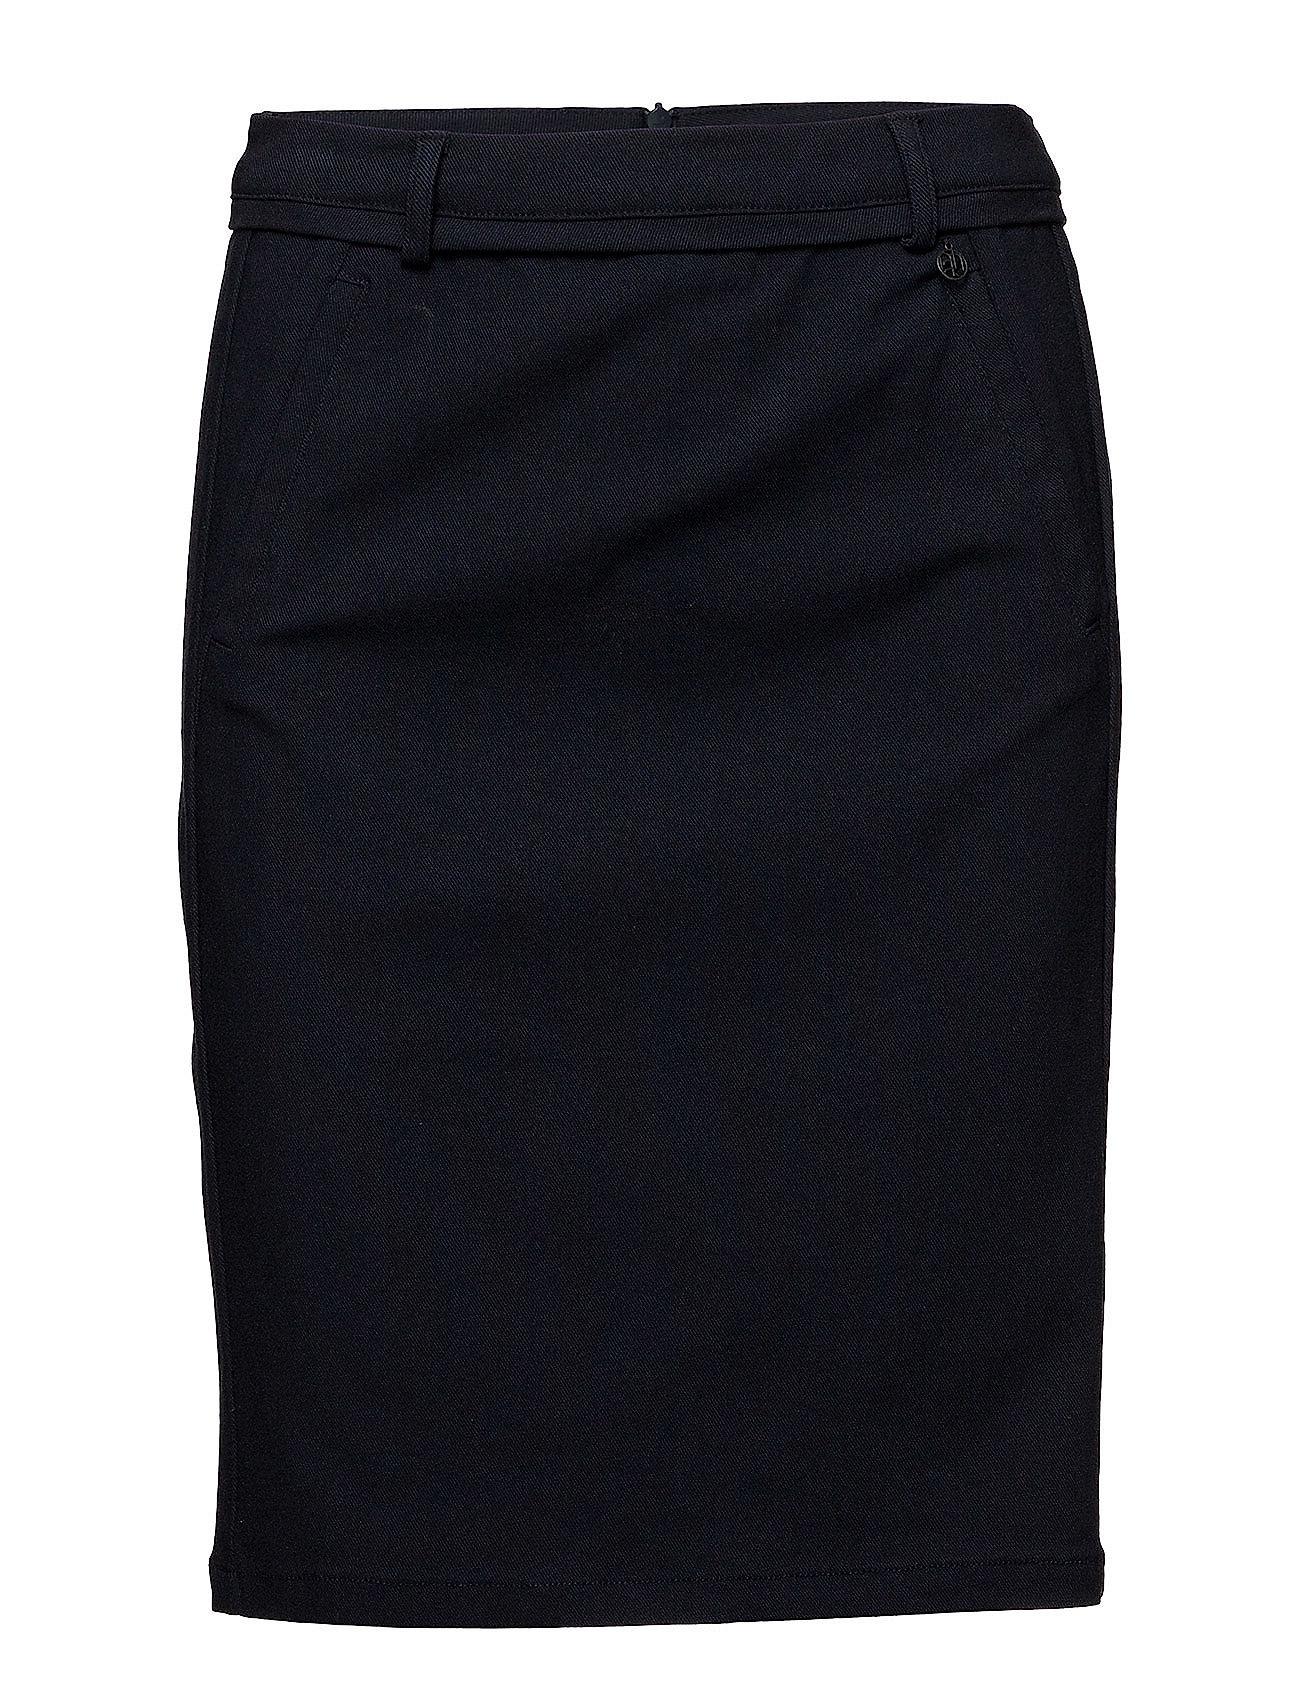 Minus Carma skirt - BLACK IRIS